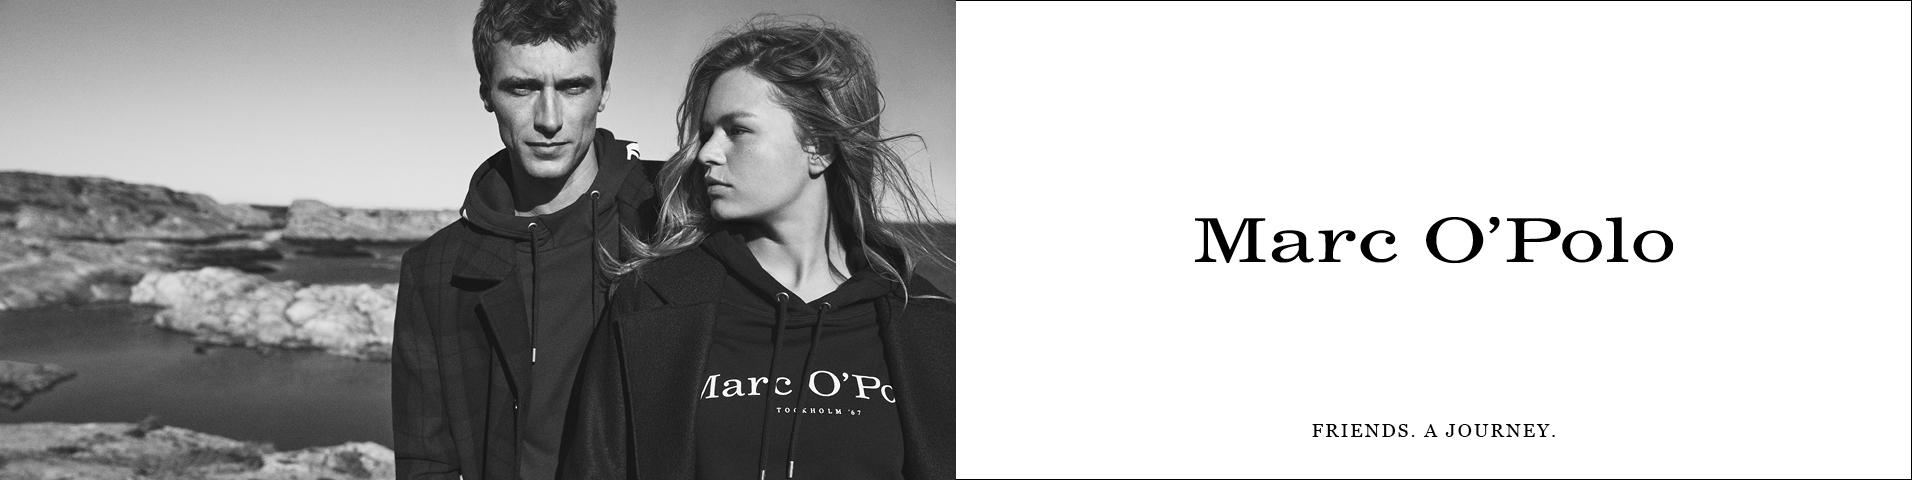 promo code 481ba f0f5d Marc O'Polo Outlet bei Zalando | Fashion im Sale bei Zalando ...